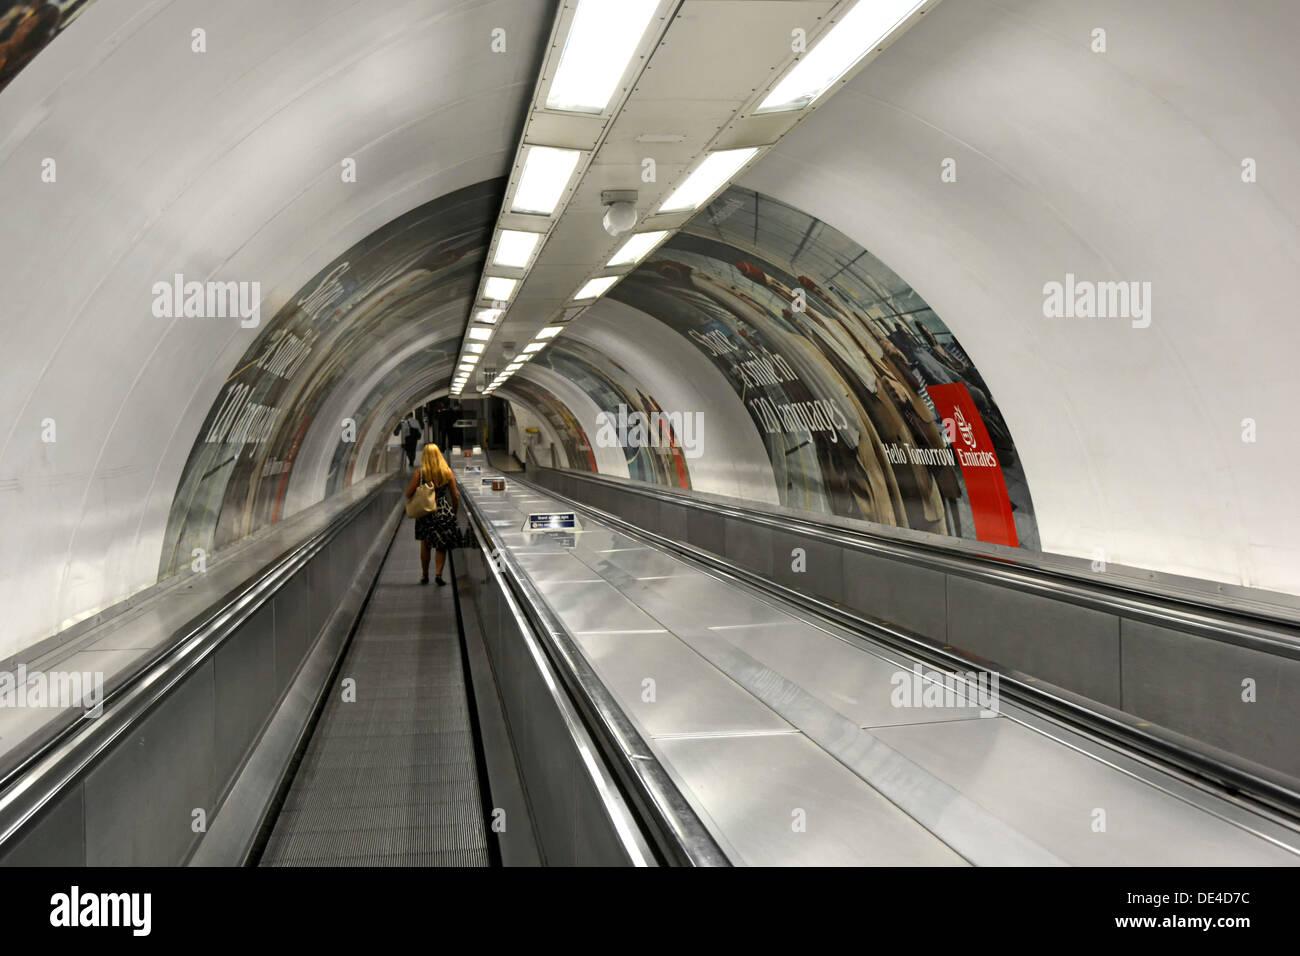 Frau auf travelator, die Fahrbahn im Tunnel zur U-Bahn, Plattform London England Großbritannien Stockbild